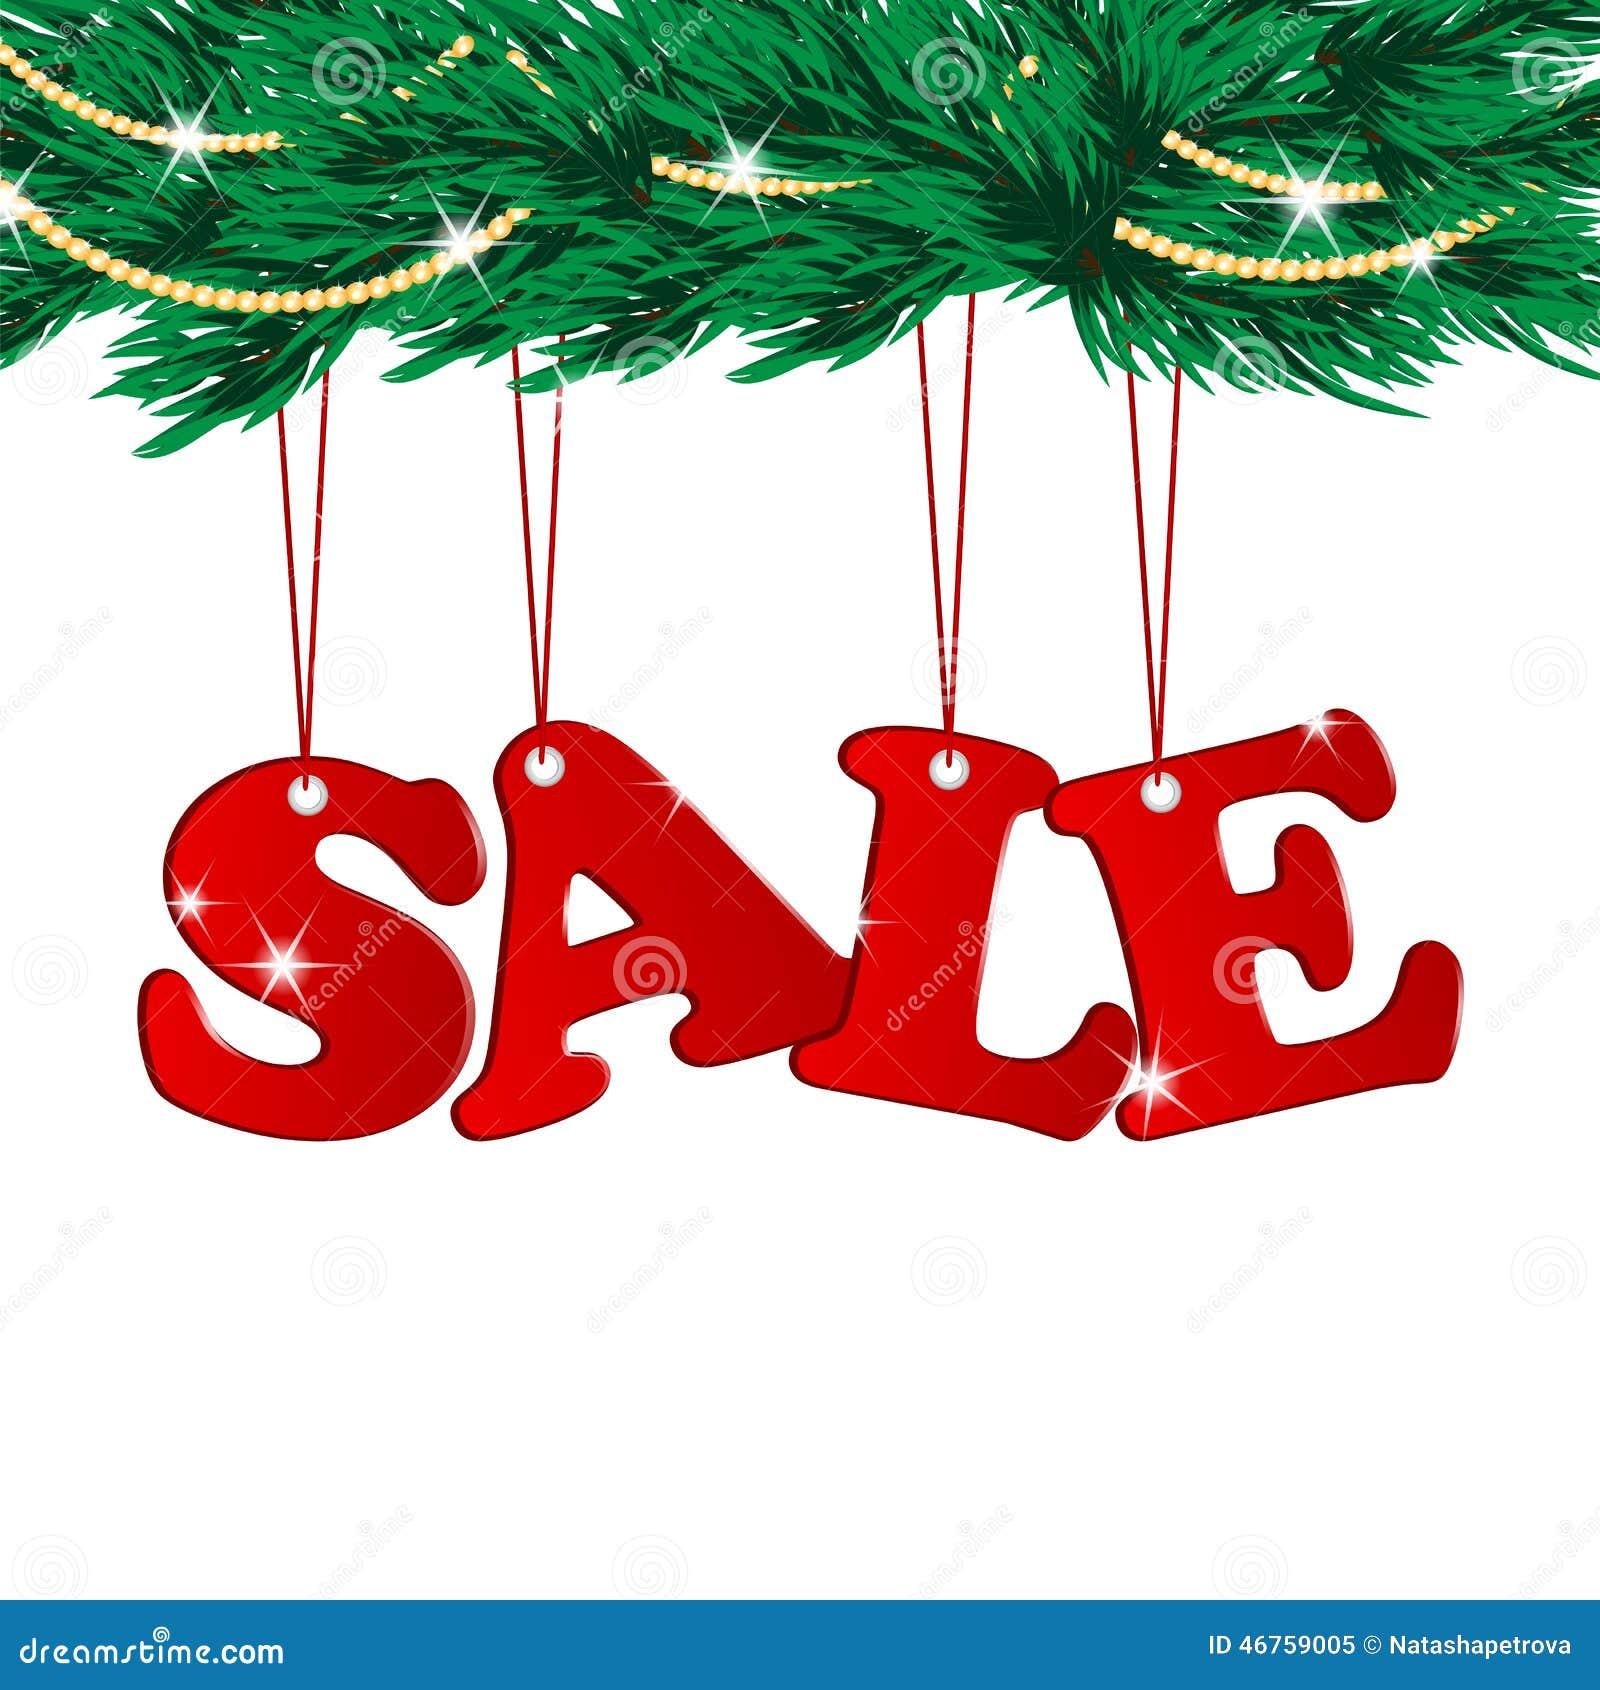 Christmas sale tags and christmas tree stock vector for Christmas tree decorations sale